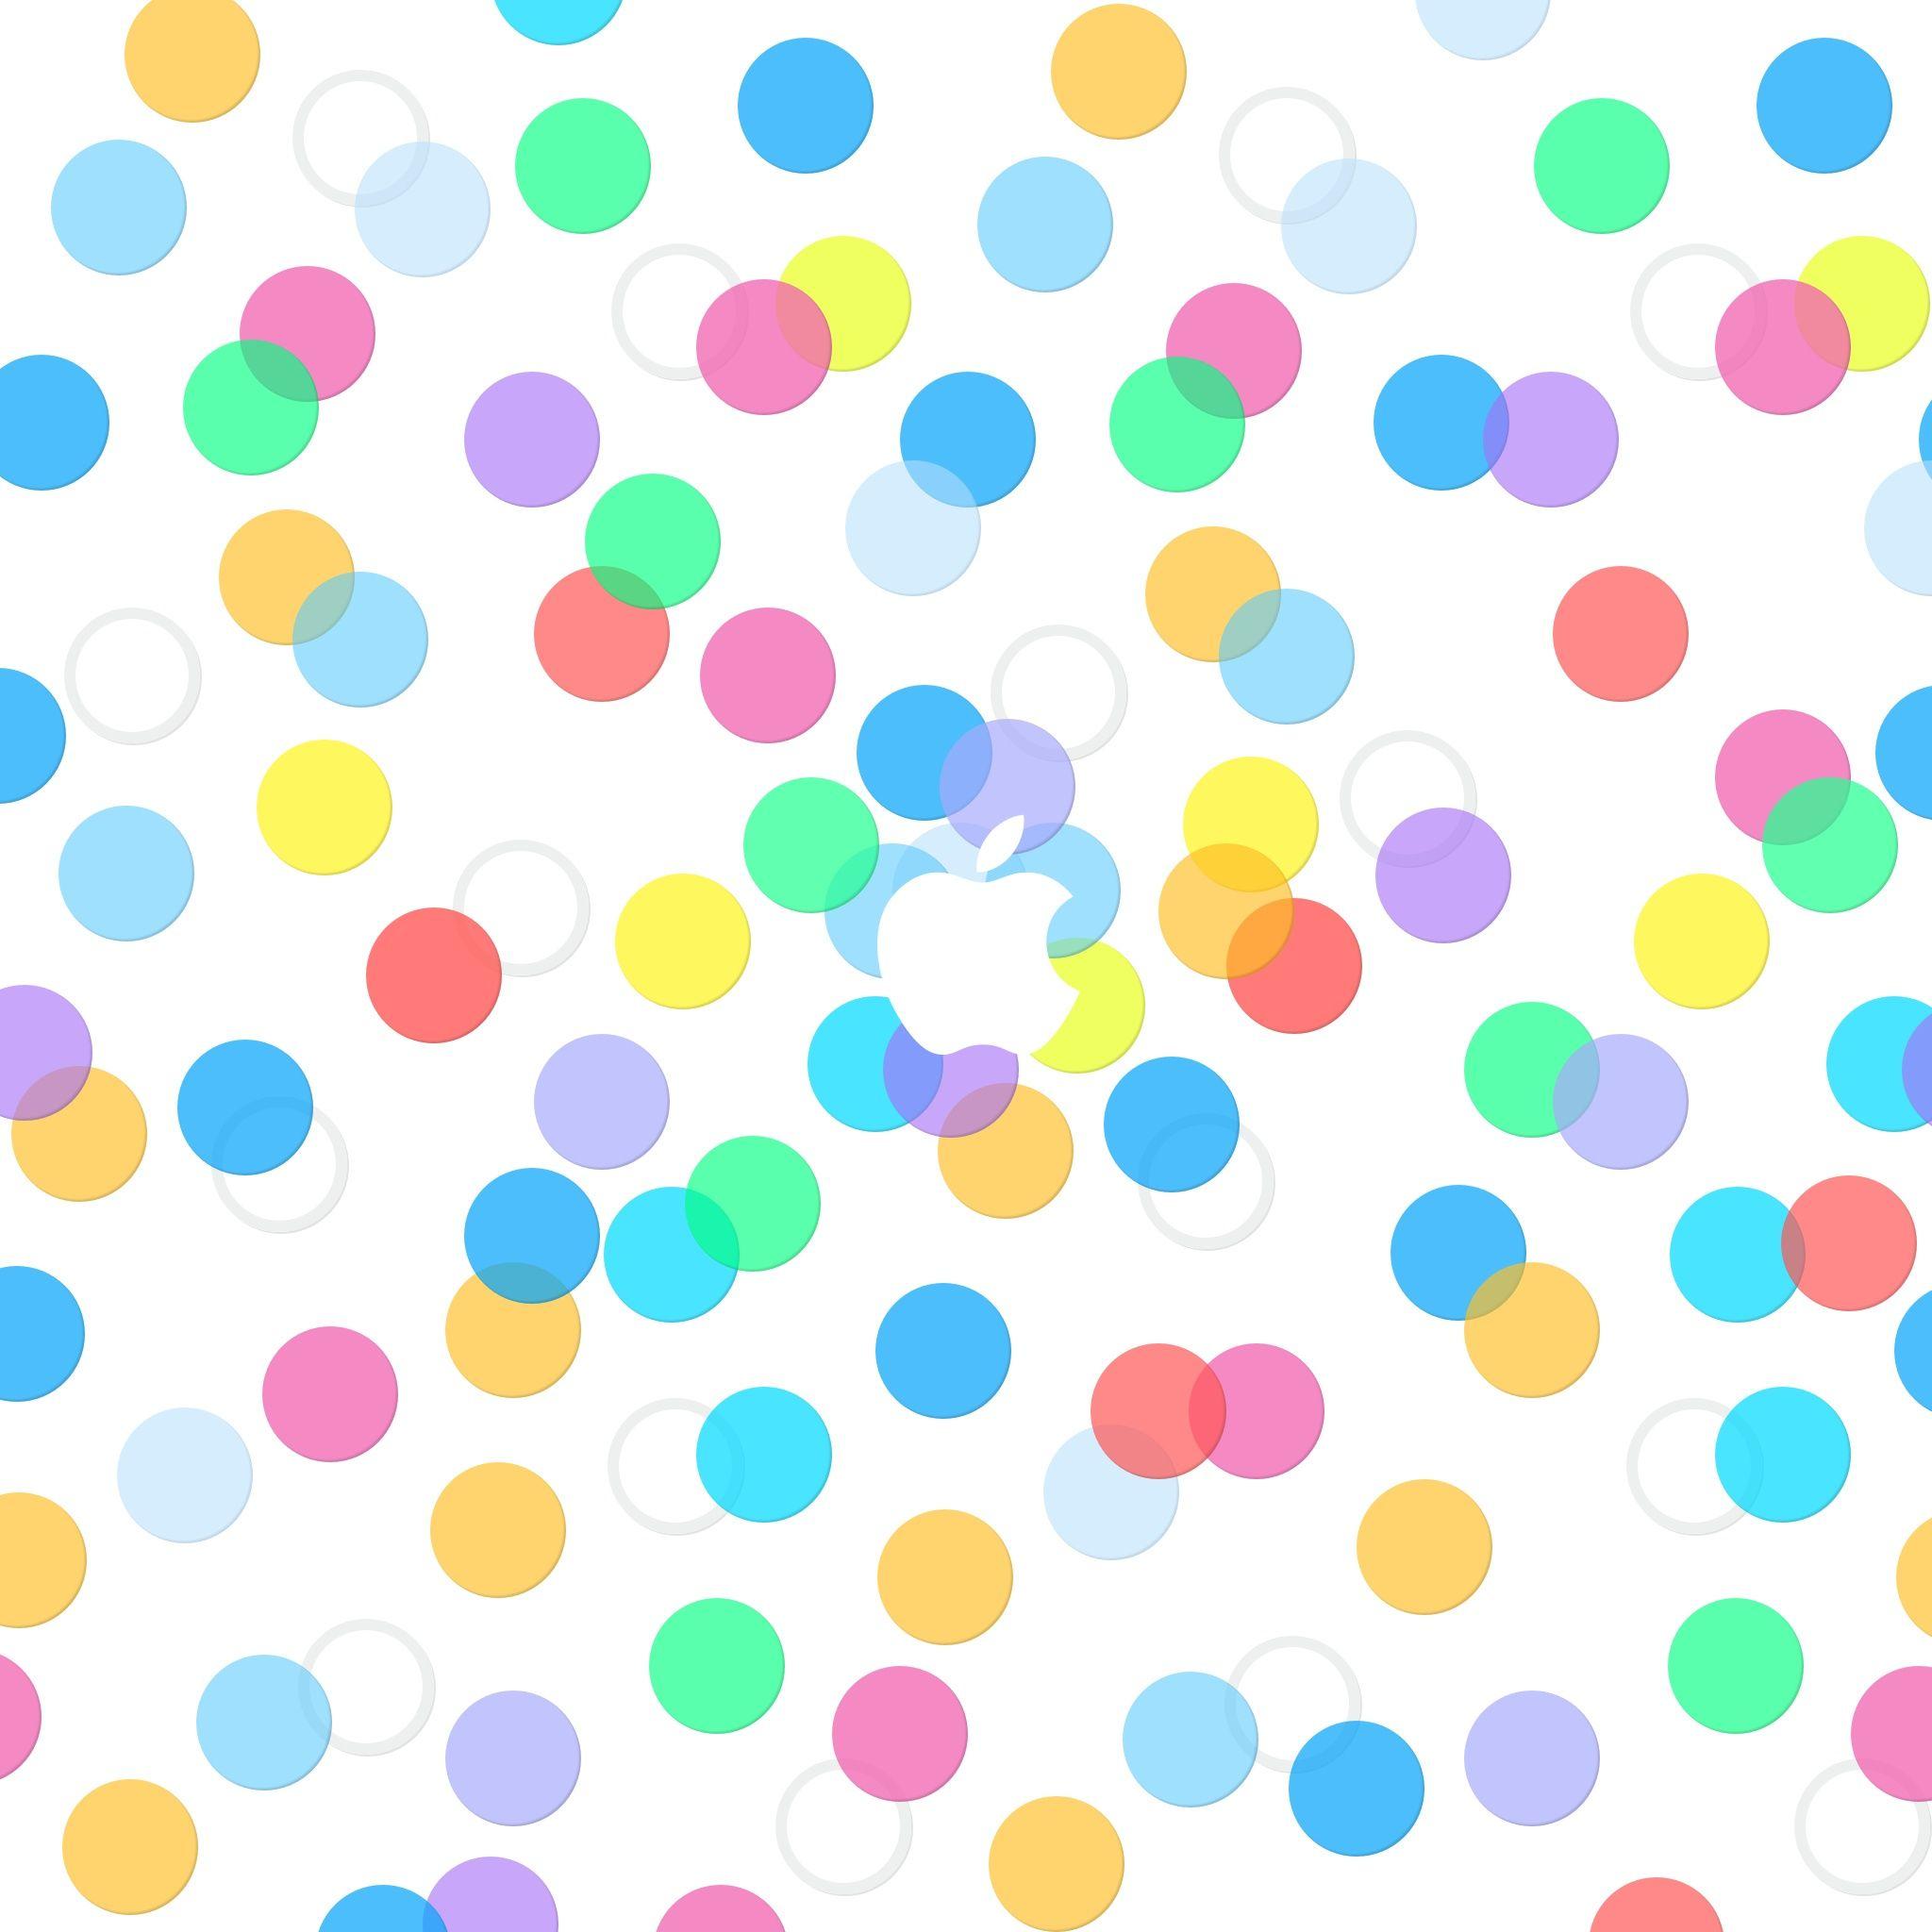 Apple Logo Colorful Dots Pattern Ipad Wallpaper Hd Apple